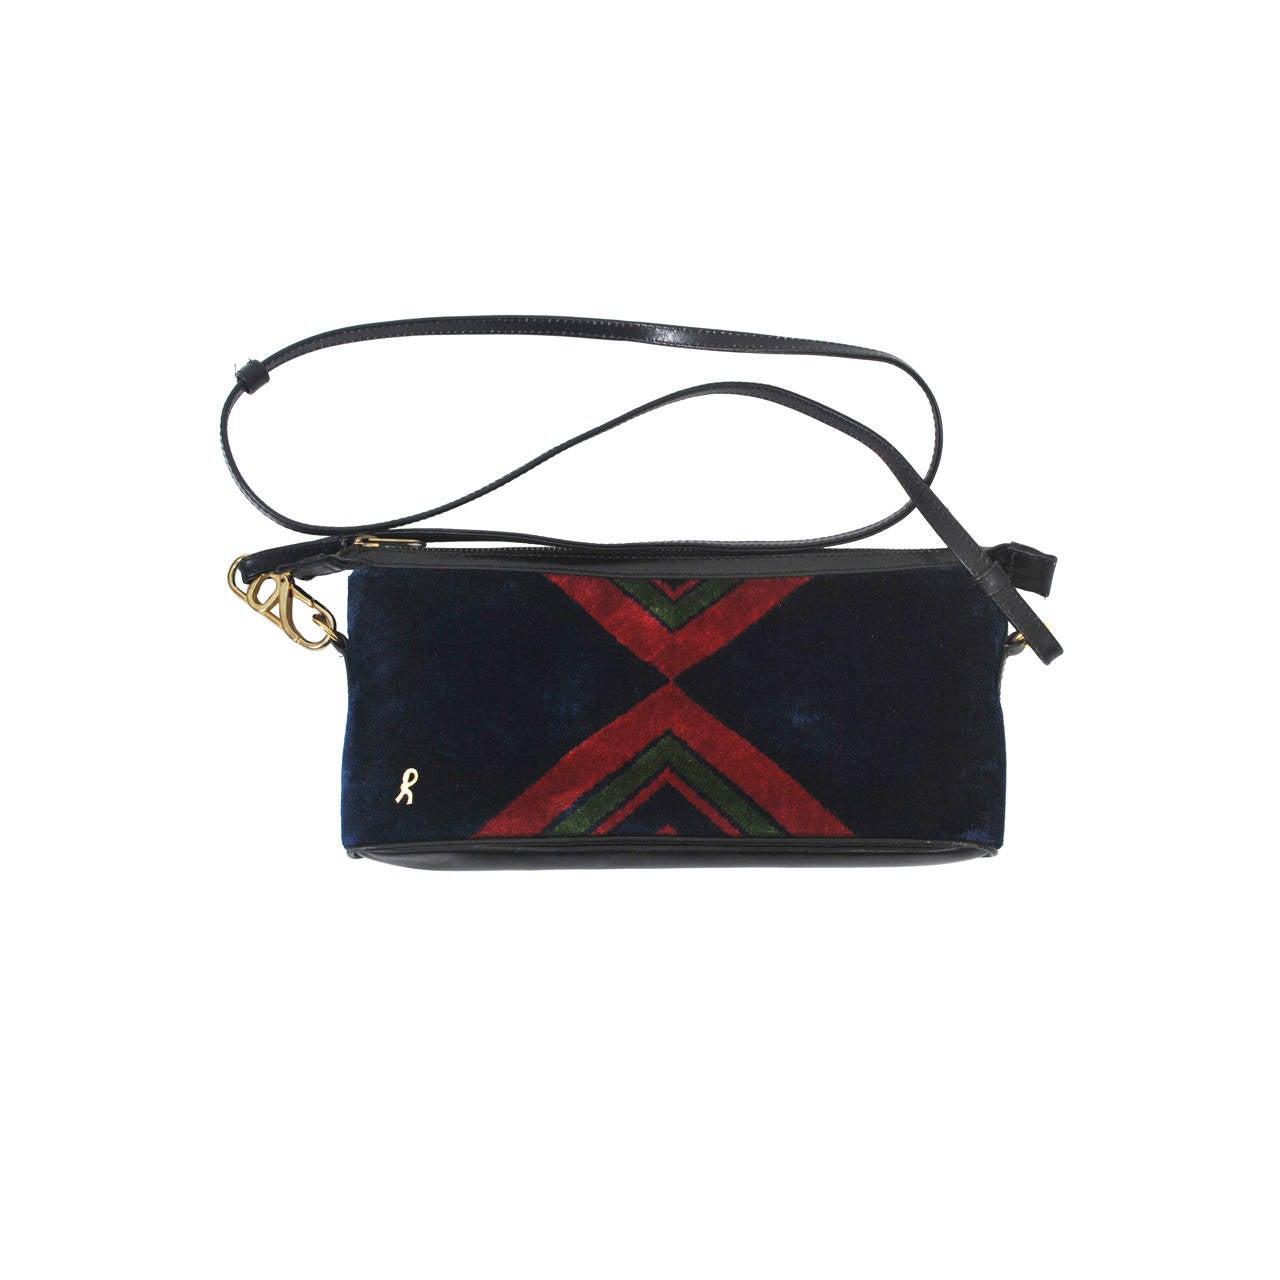 Roberta di Camerino Oblong Velvet Shoulder Bag